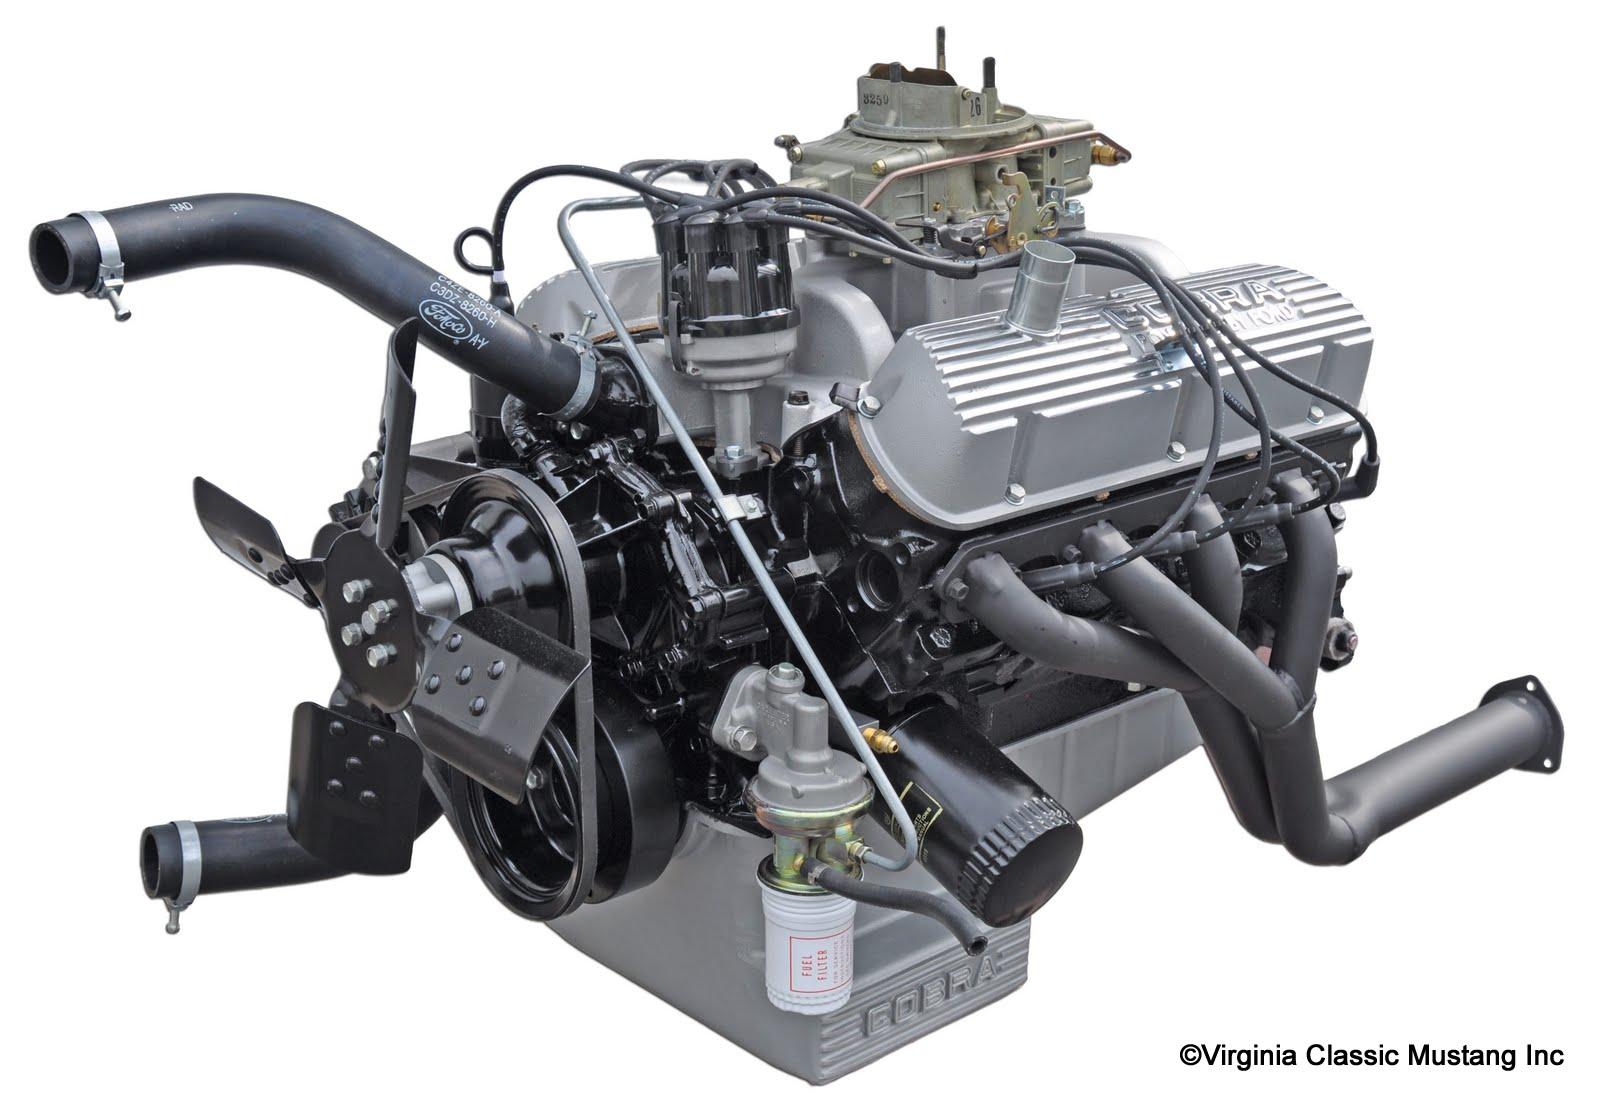 [DIAGRAM] Ford 289 Motor Diagram FULL Version HD Quality